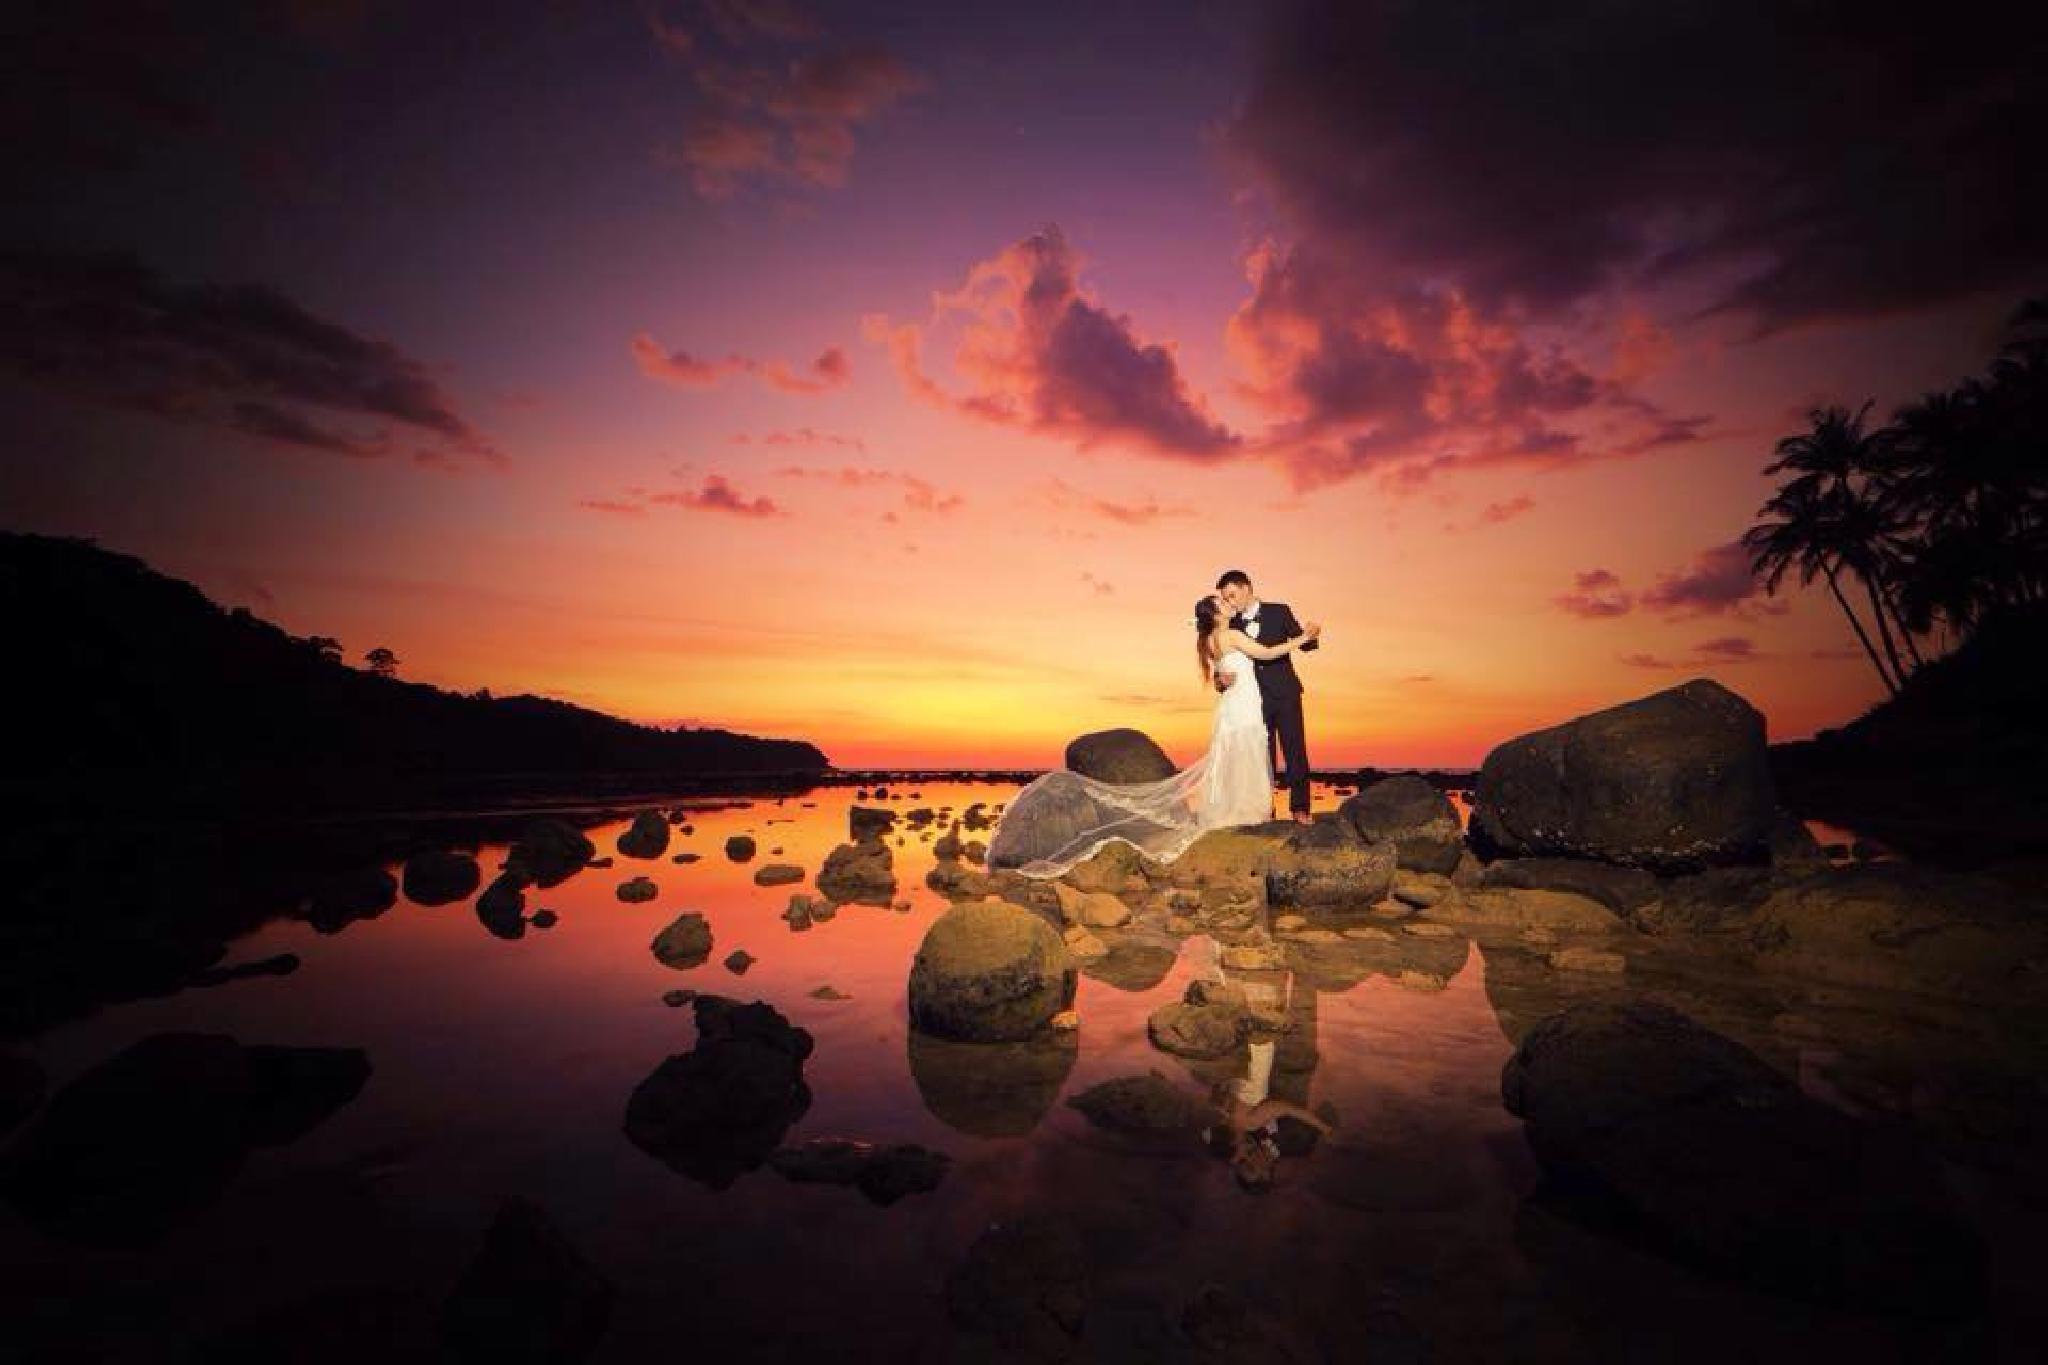 pre wedding by chalong.loysamut